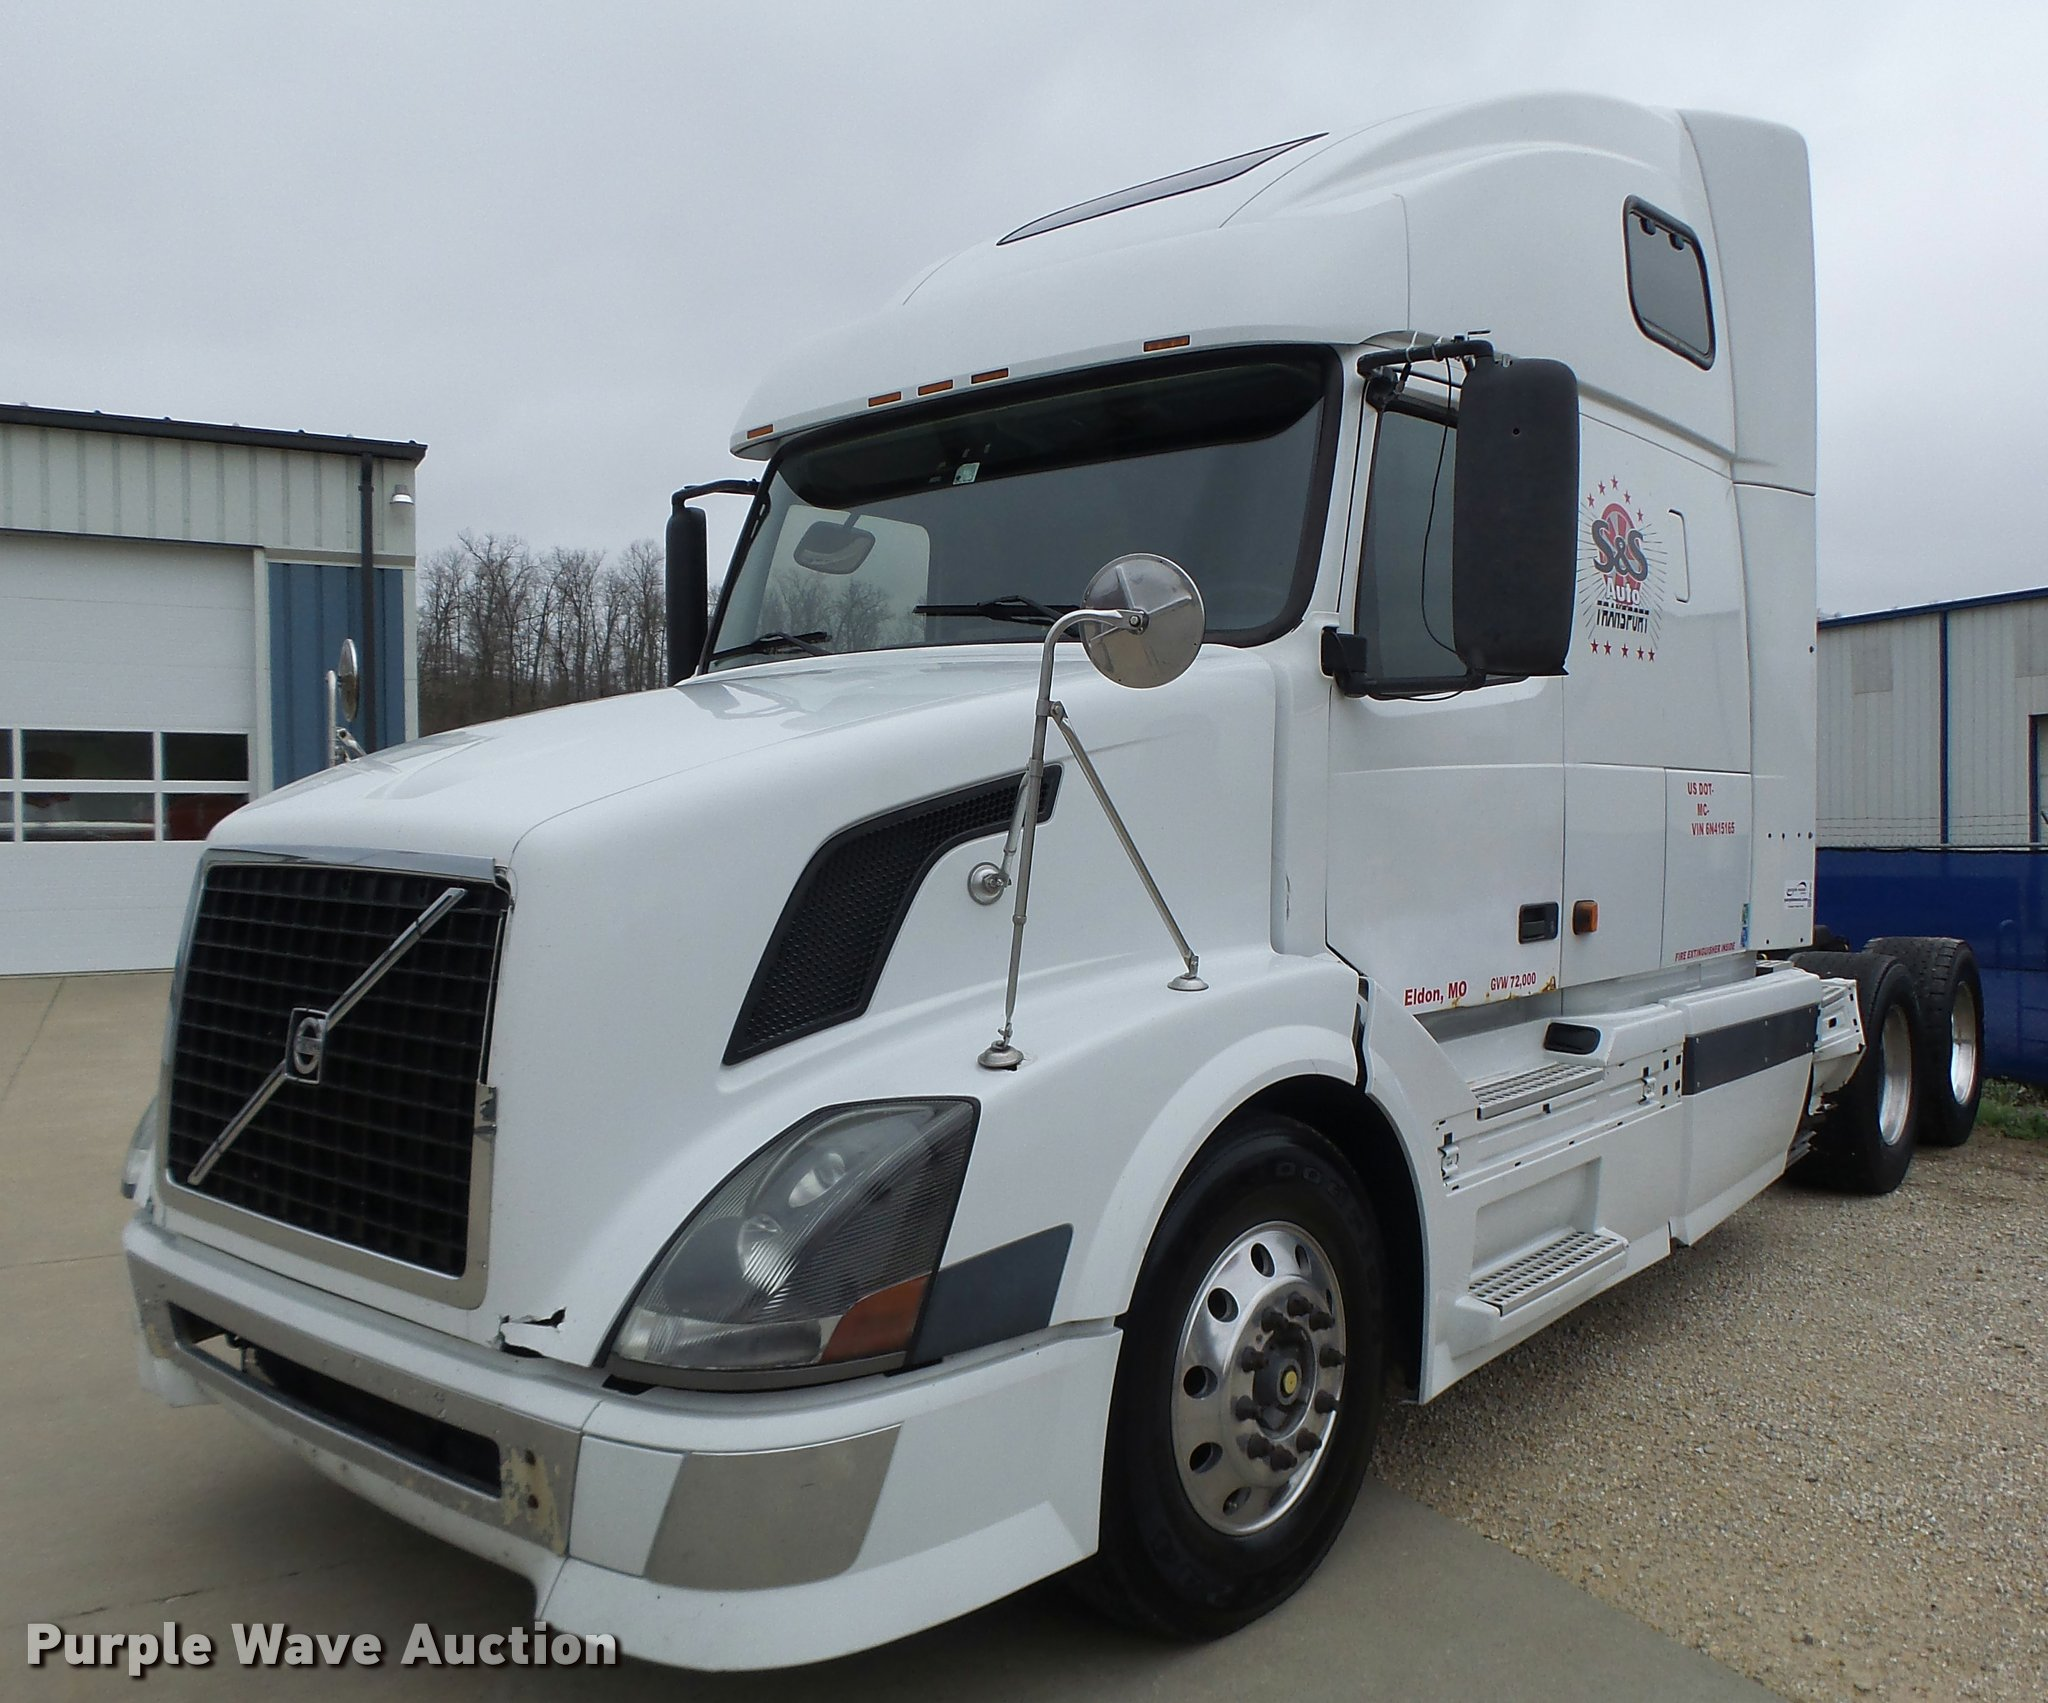 used semi volvo sale for images uvan on truck us trucks best pinterest by owner